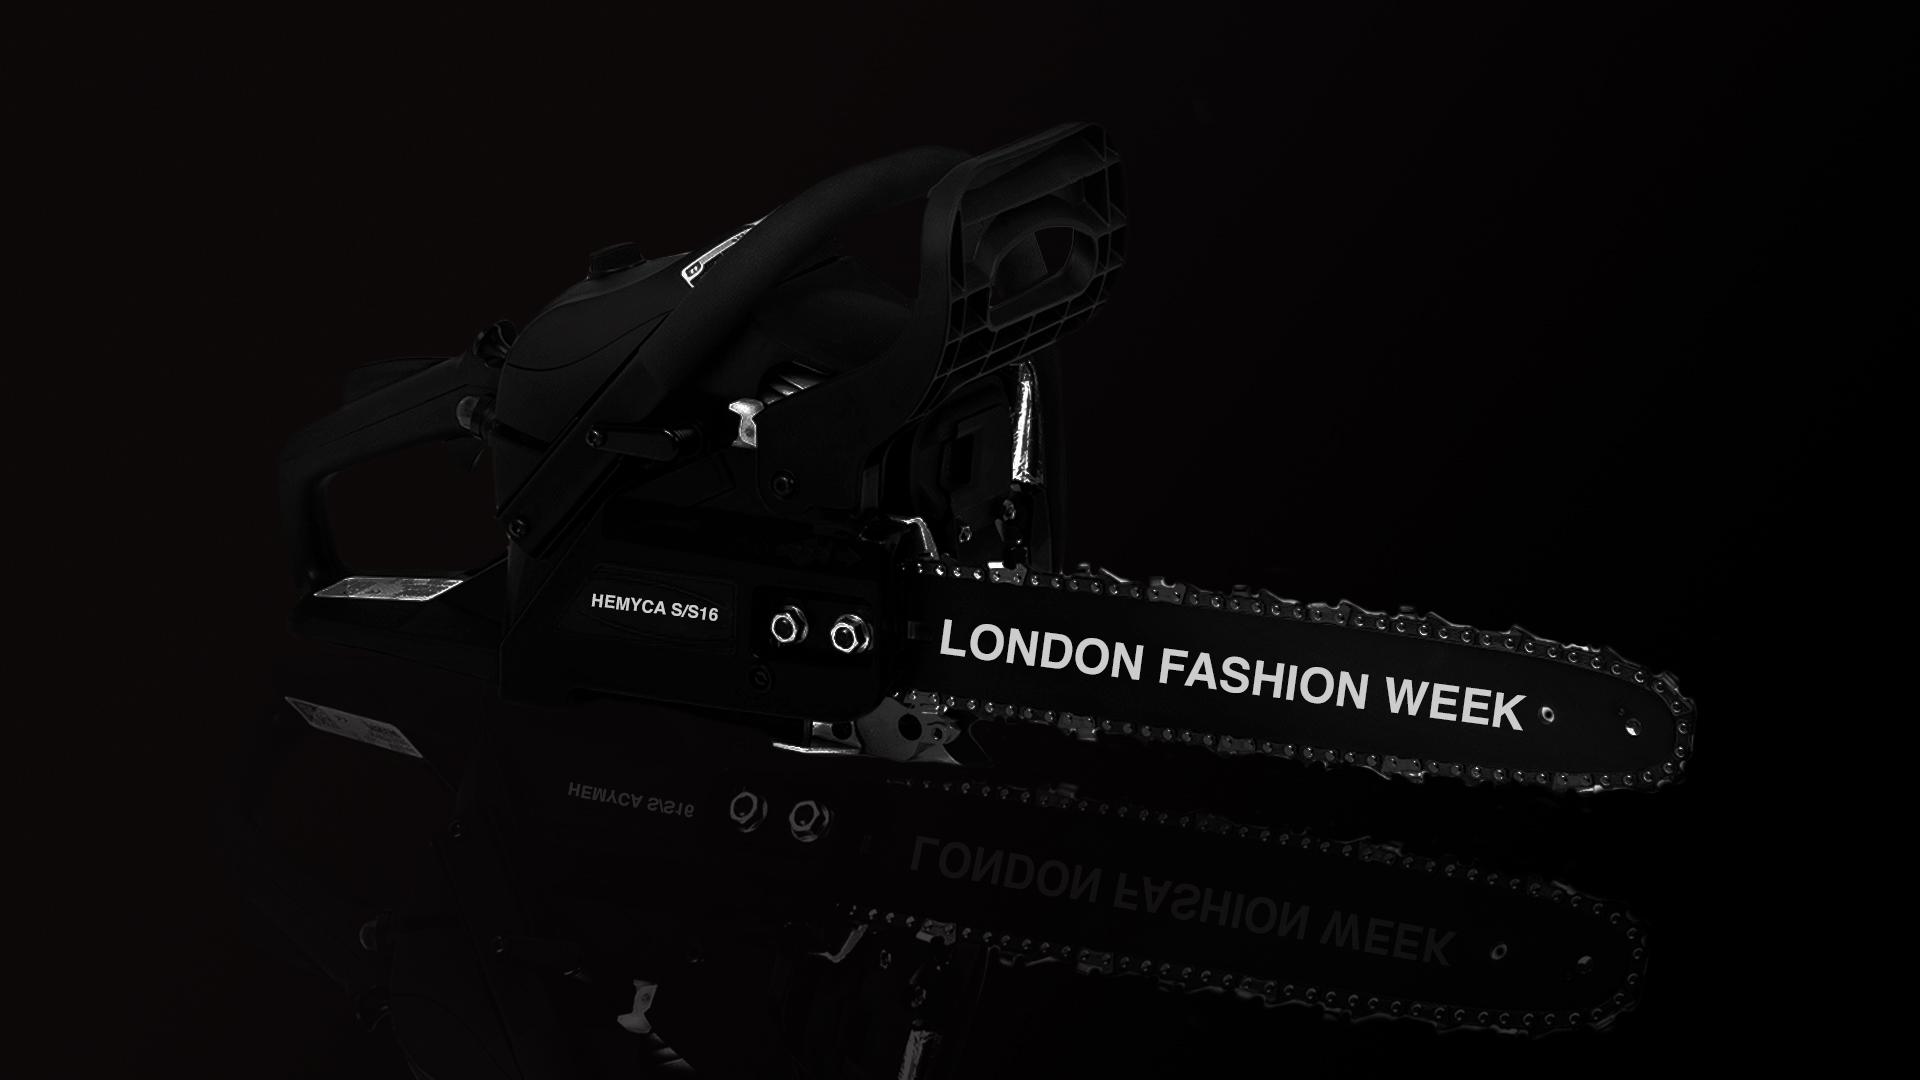 HEMYCA, London Fashion Week